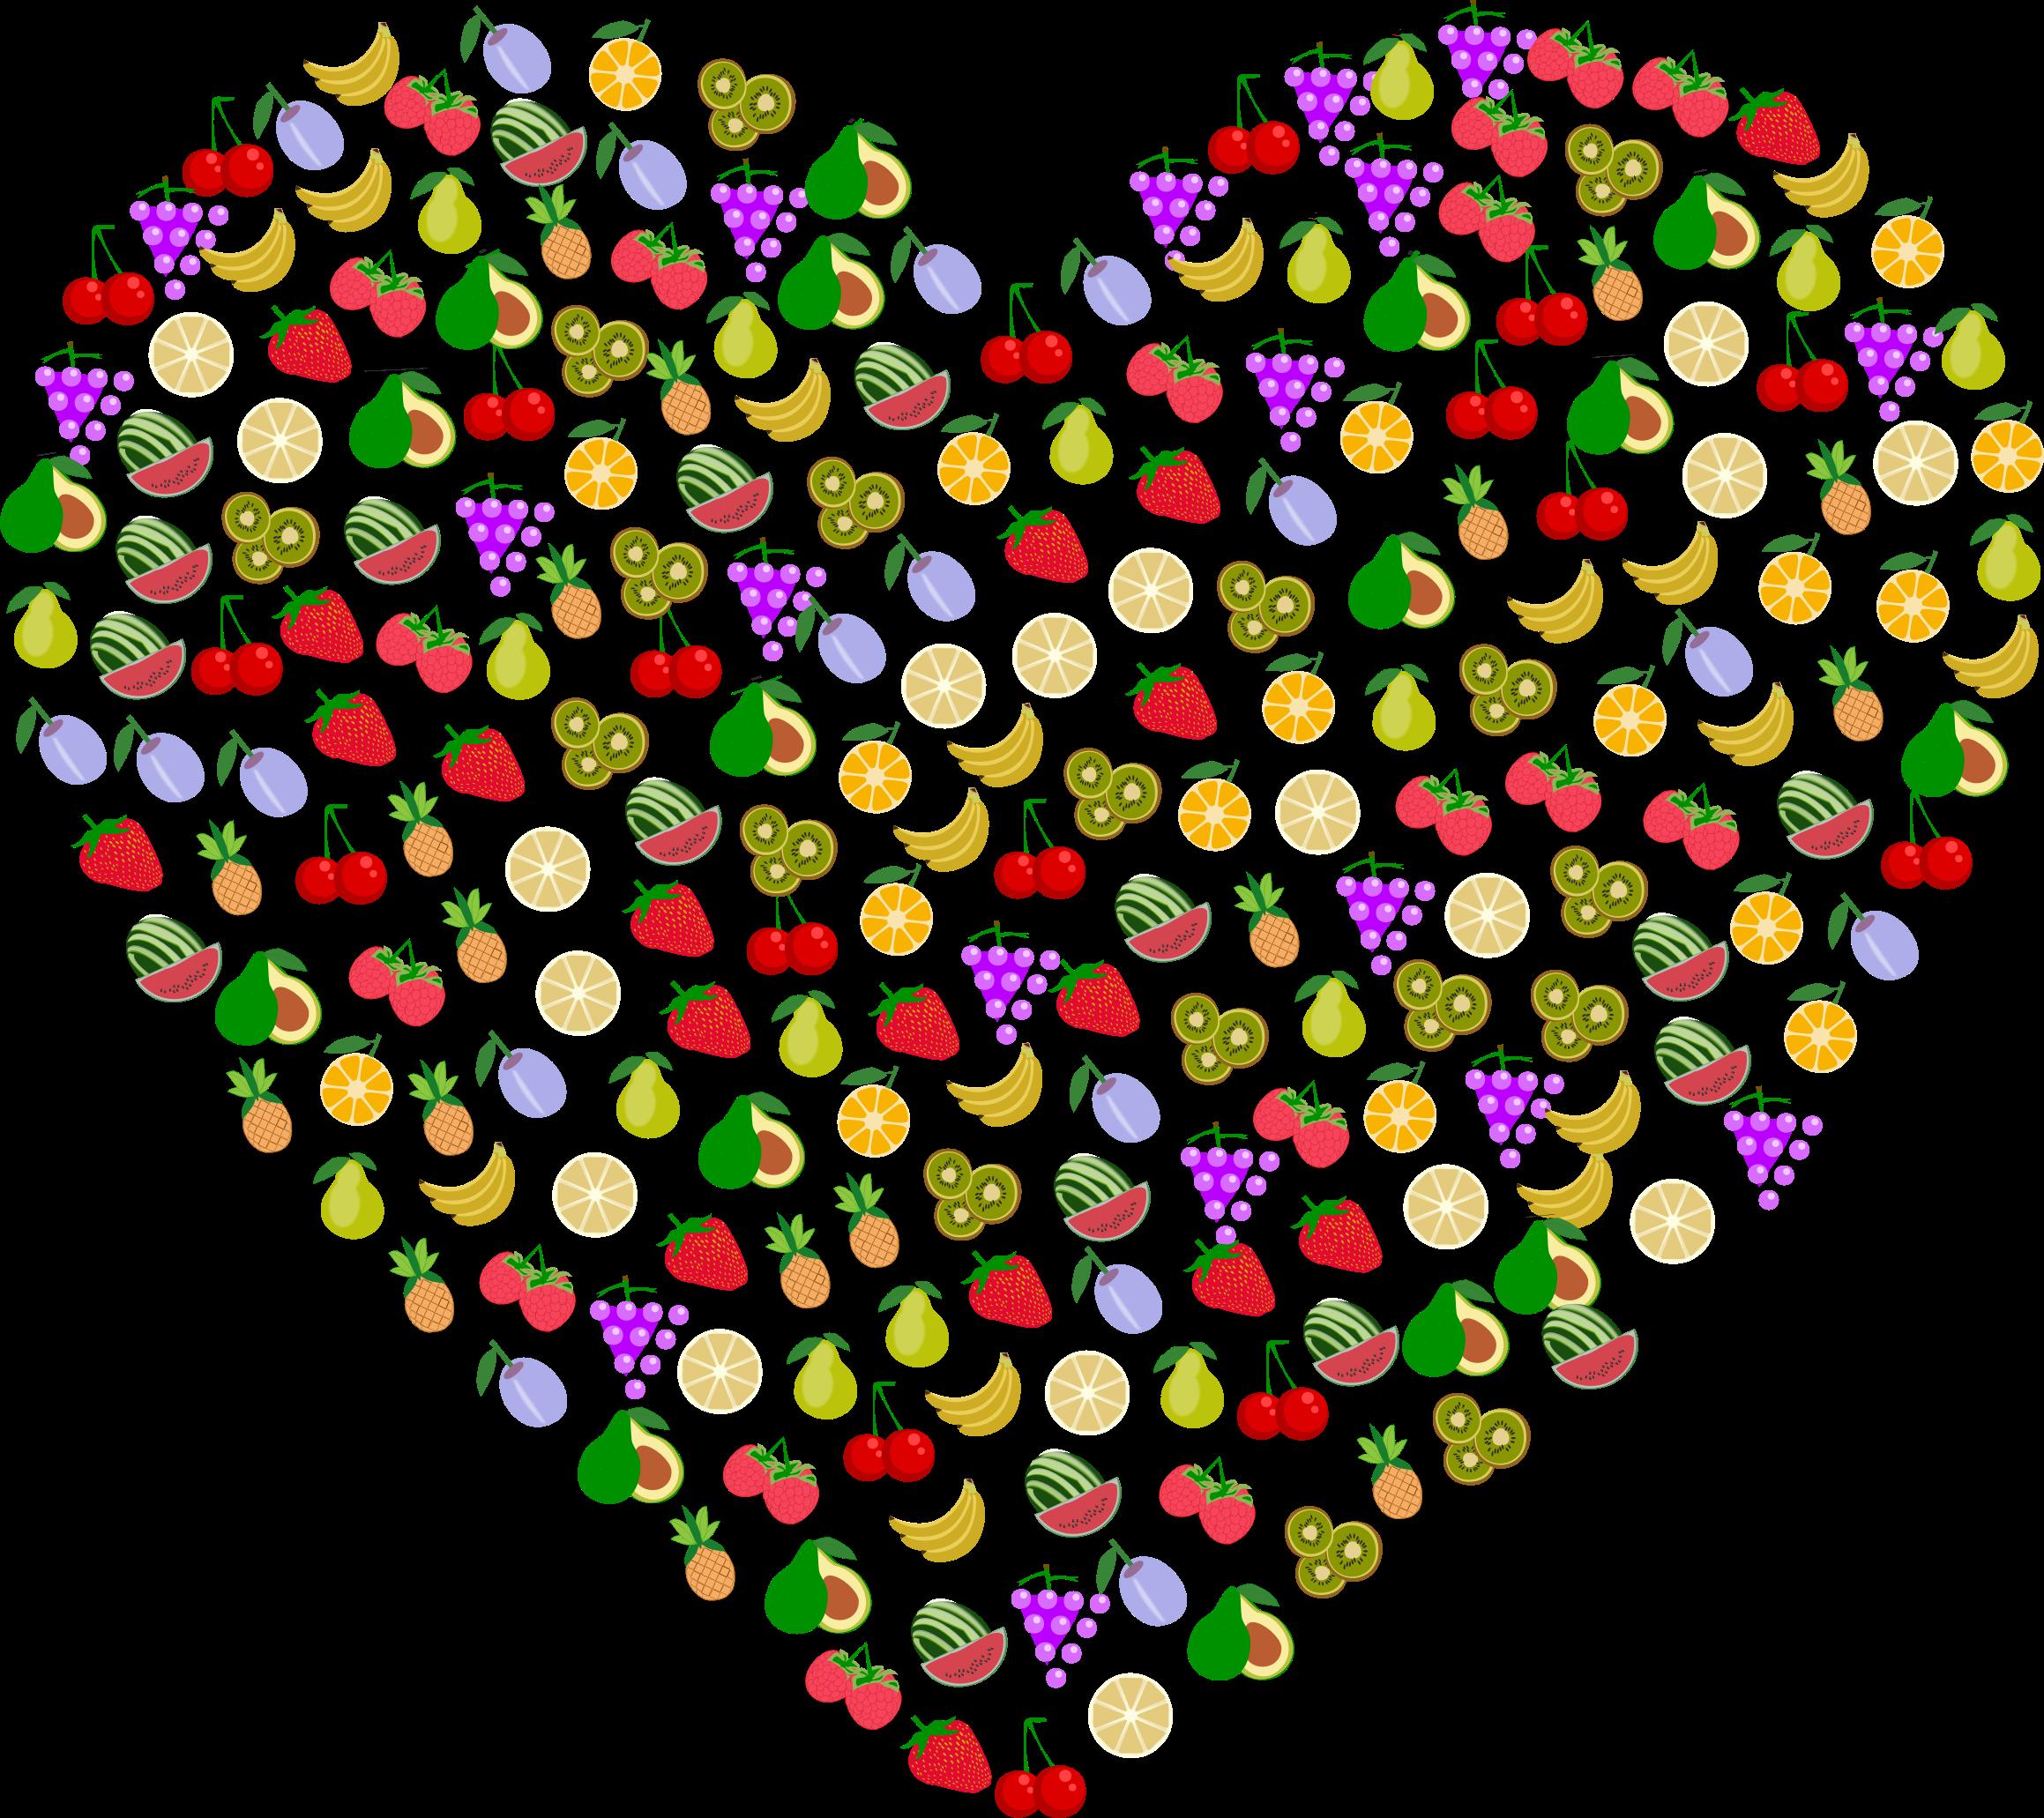 Big image png. Heart clipart fruit